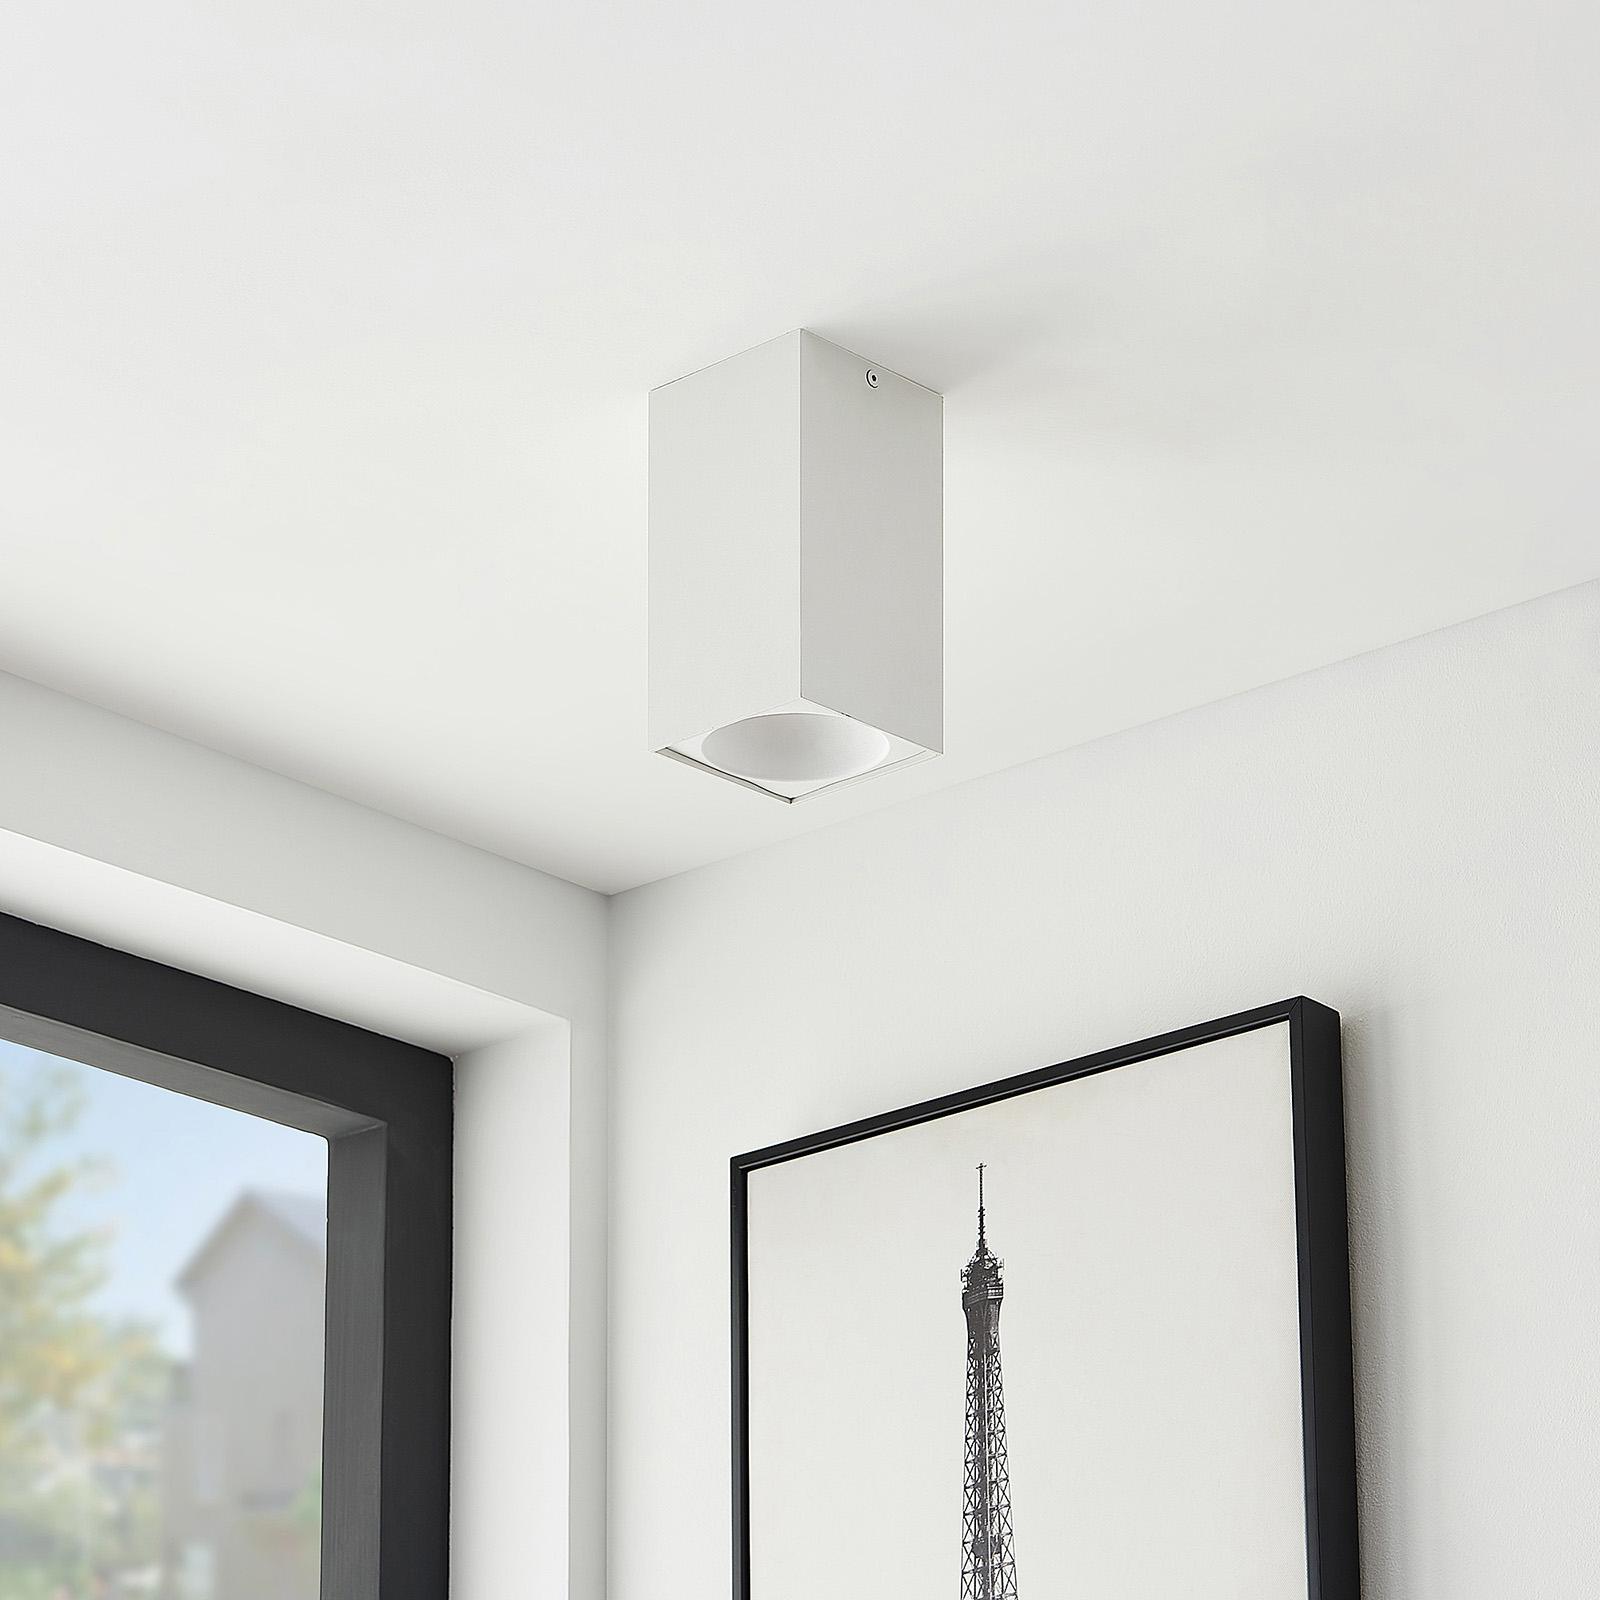 Arcchio Hinka plafondlamp, hoekig, 18 cm, wit